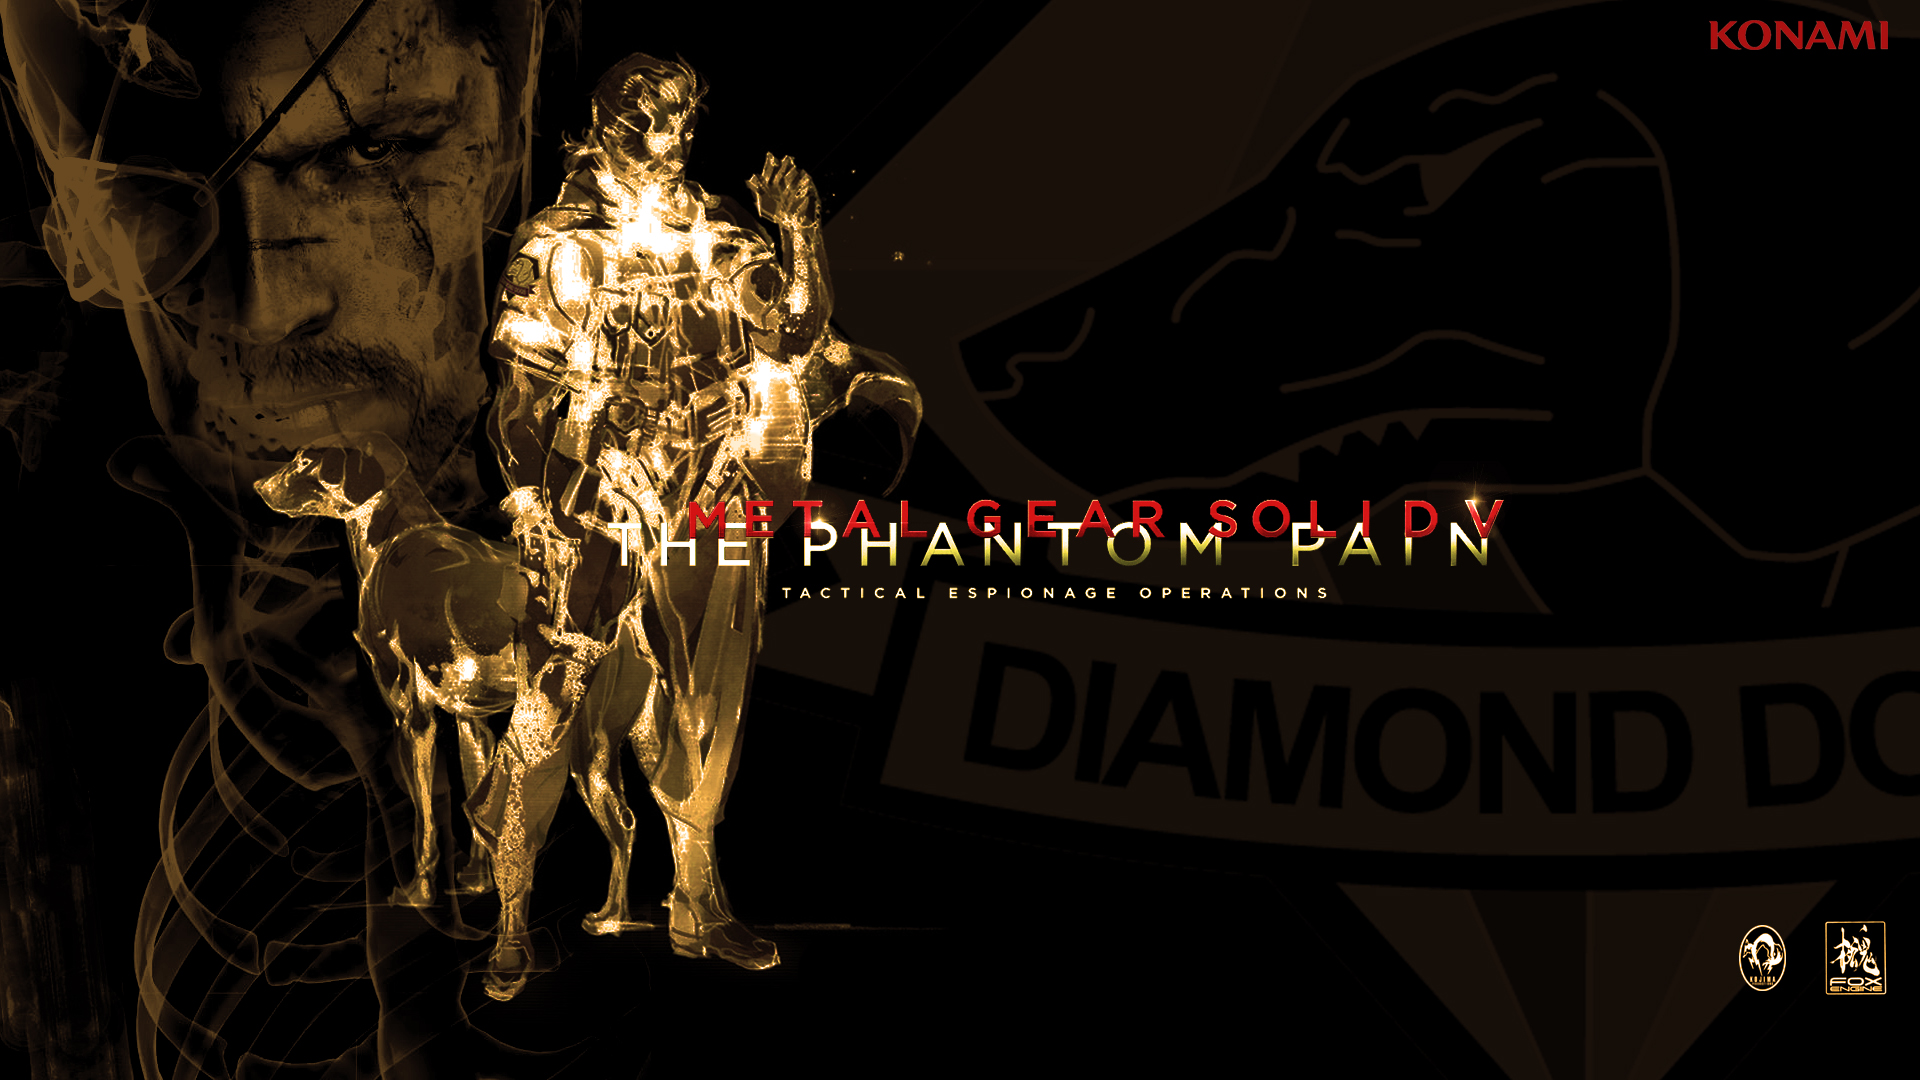 Free Download Metal Gear Solid 5 Wallpaper By Shagohod88